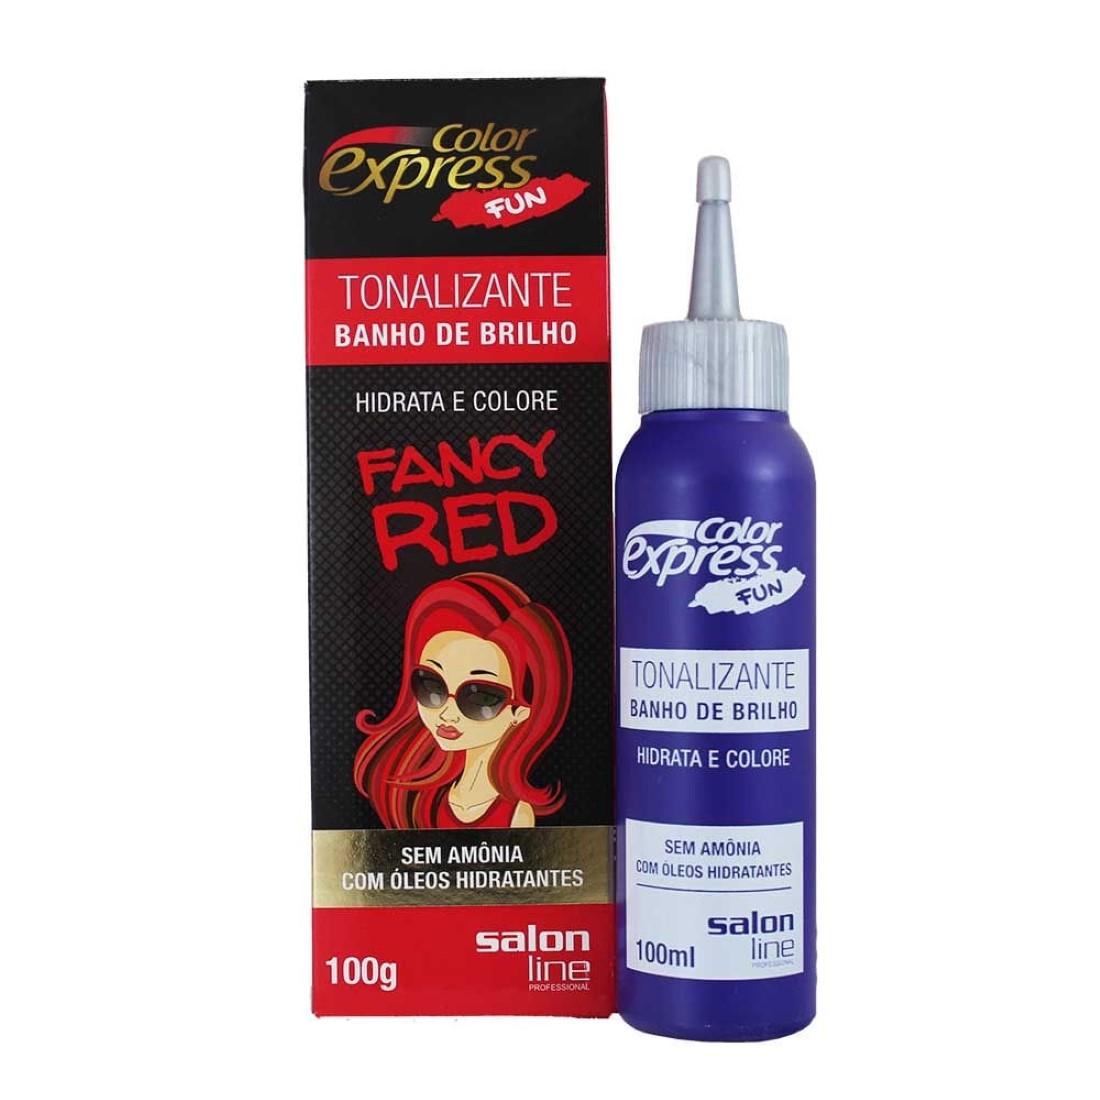 Tonalizante Color Express Fun Fancy Red 100g - Salon line